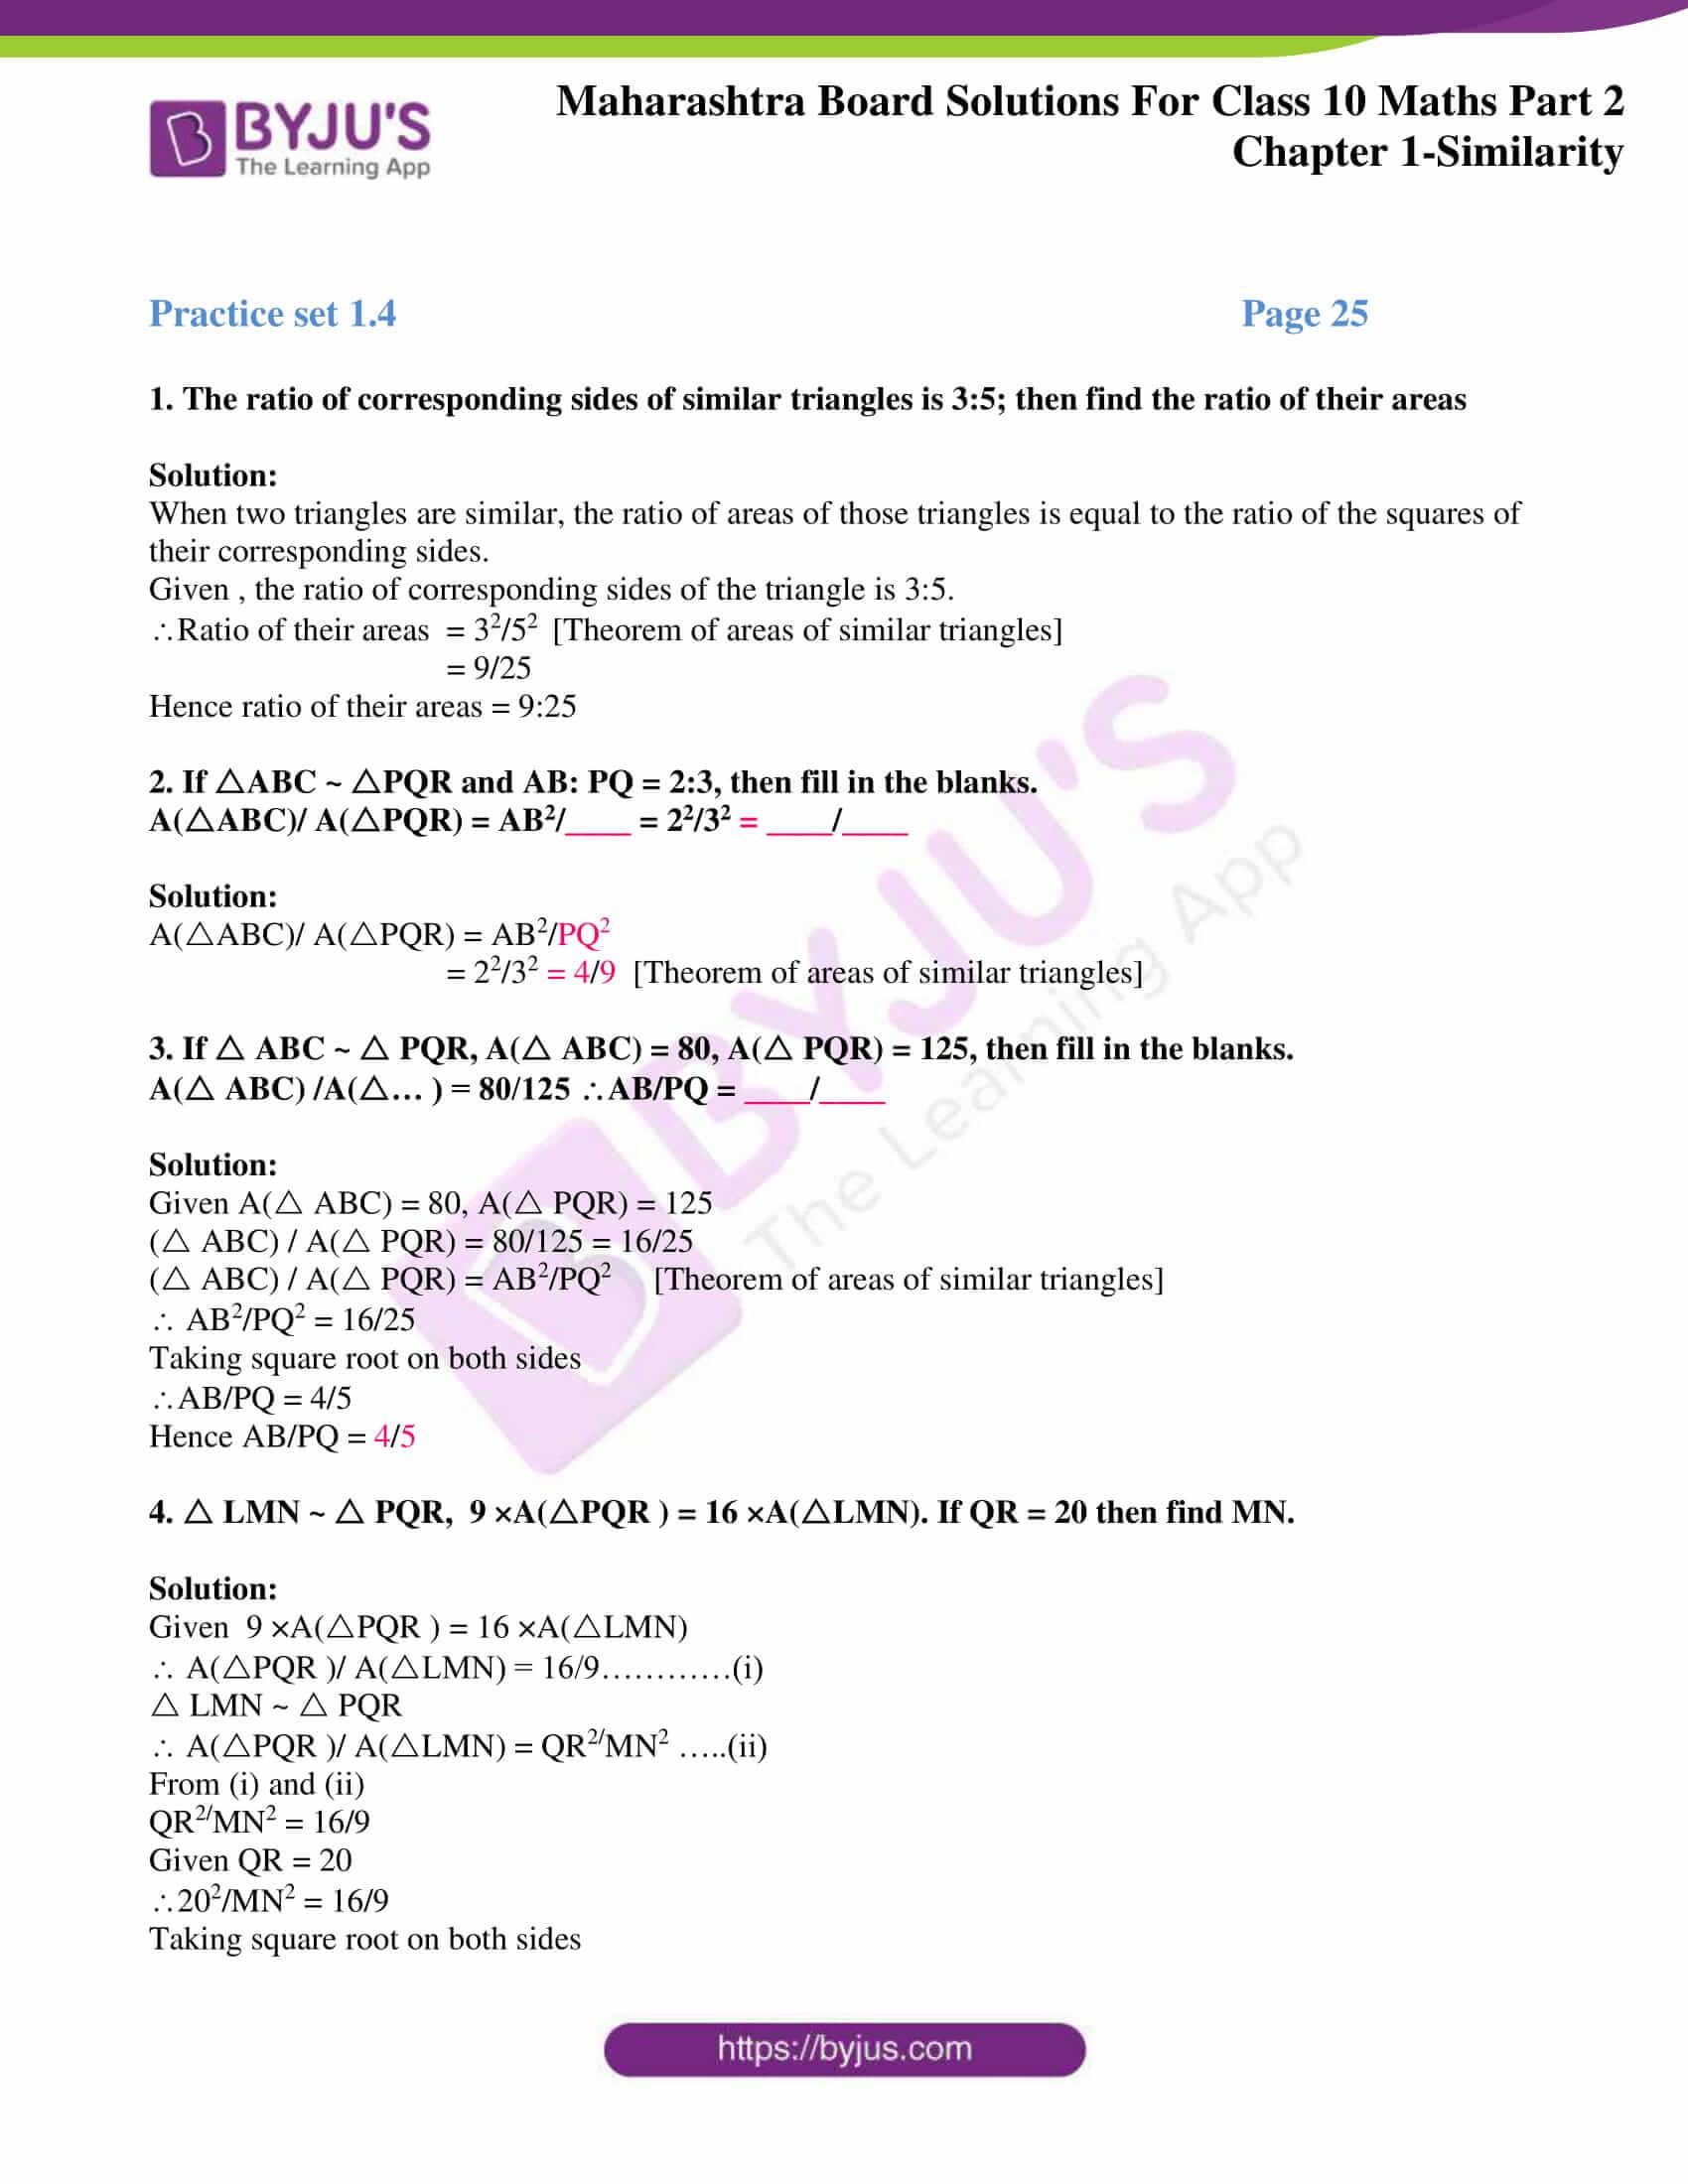 msbshse sol class 10 maths part 2 chapter 1 16